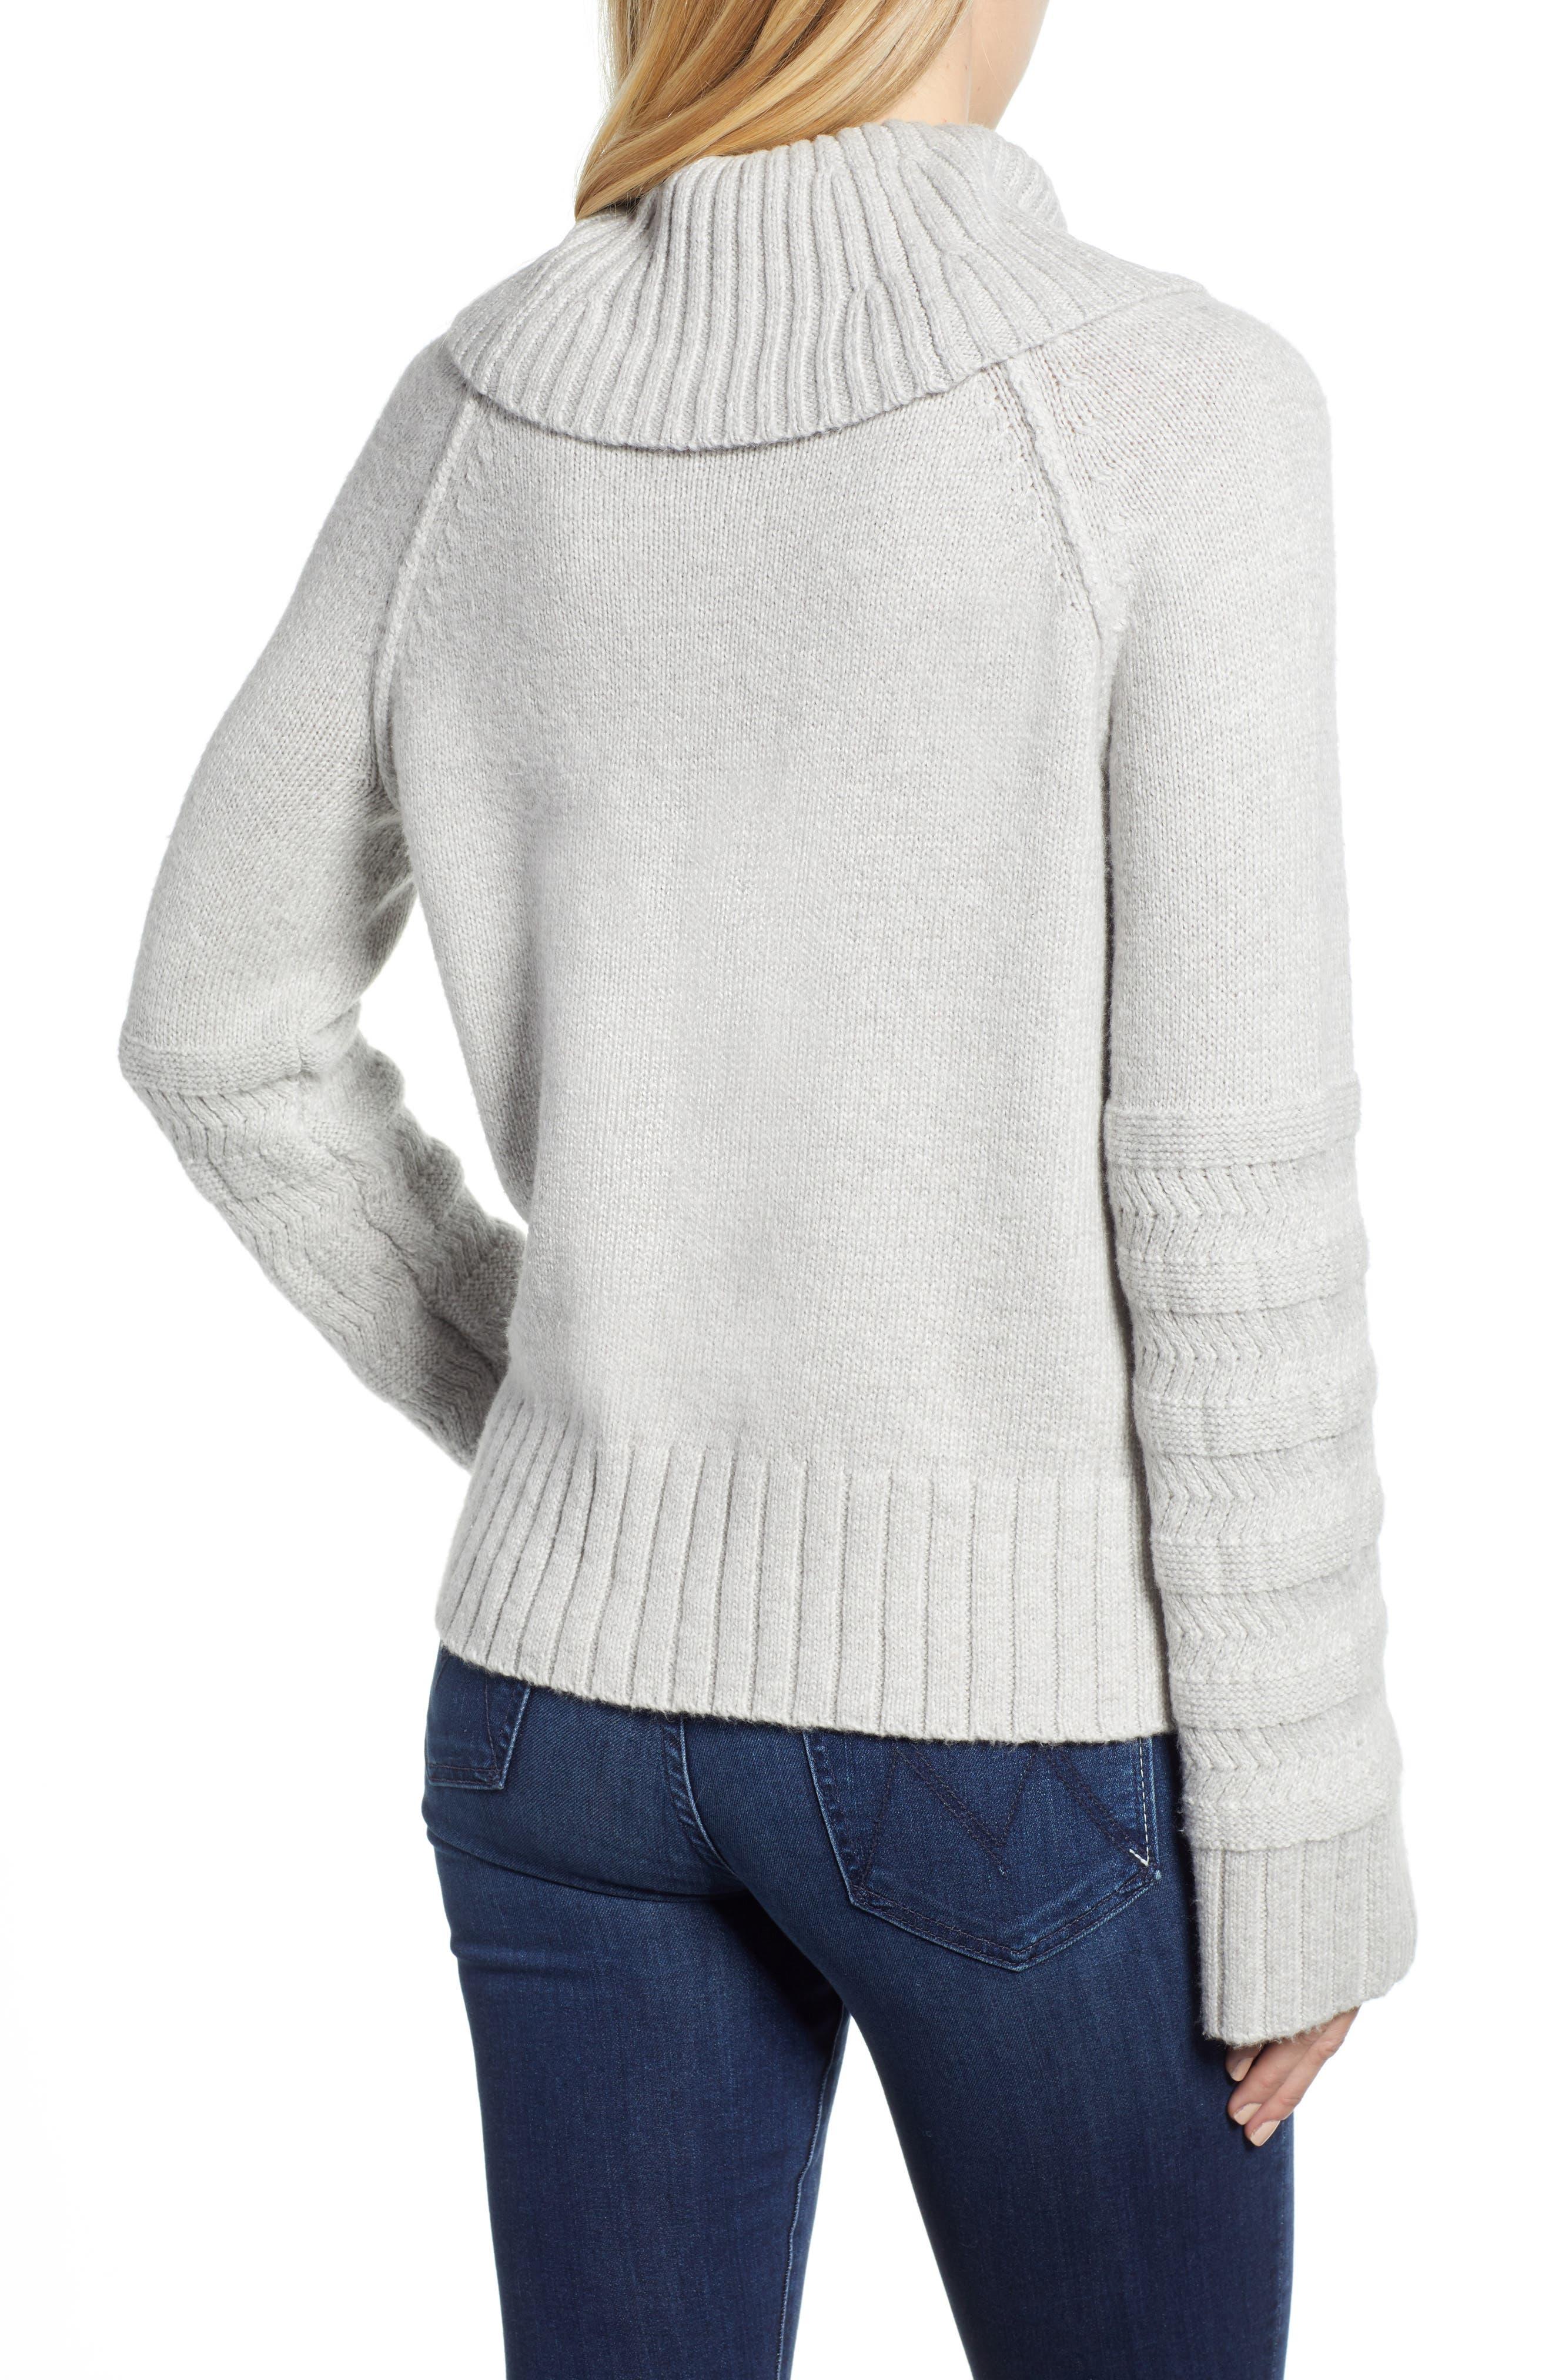 Turtleneck Sweater,                             Alternate thumbnail 2, color,                             GREY LIGHT HEATHER